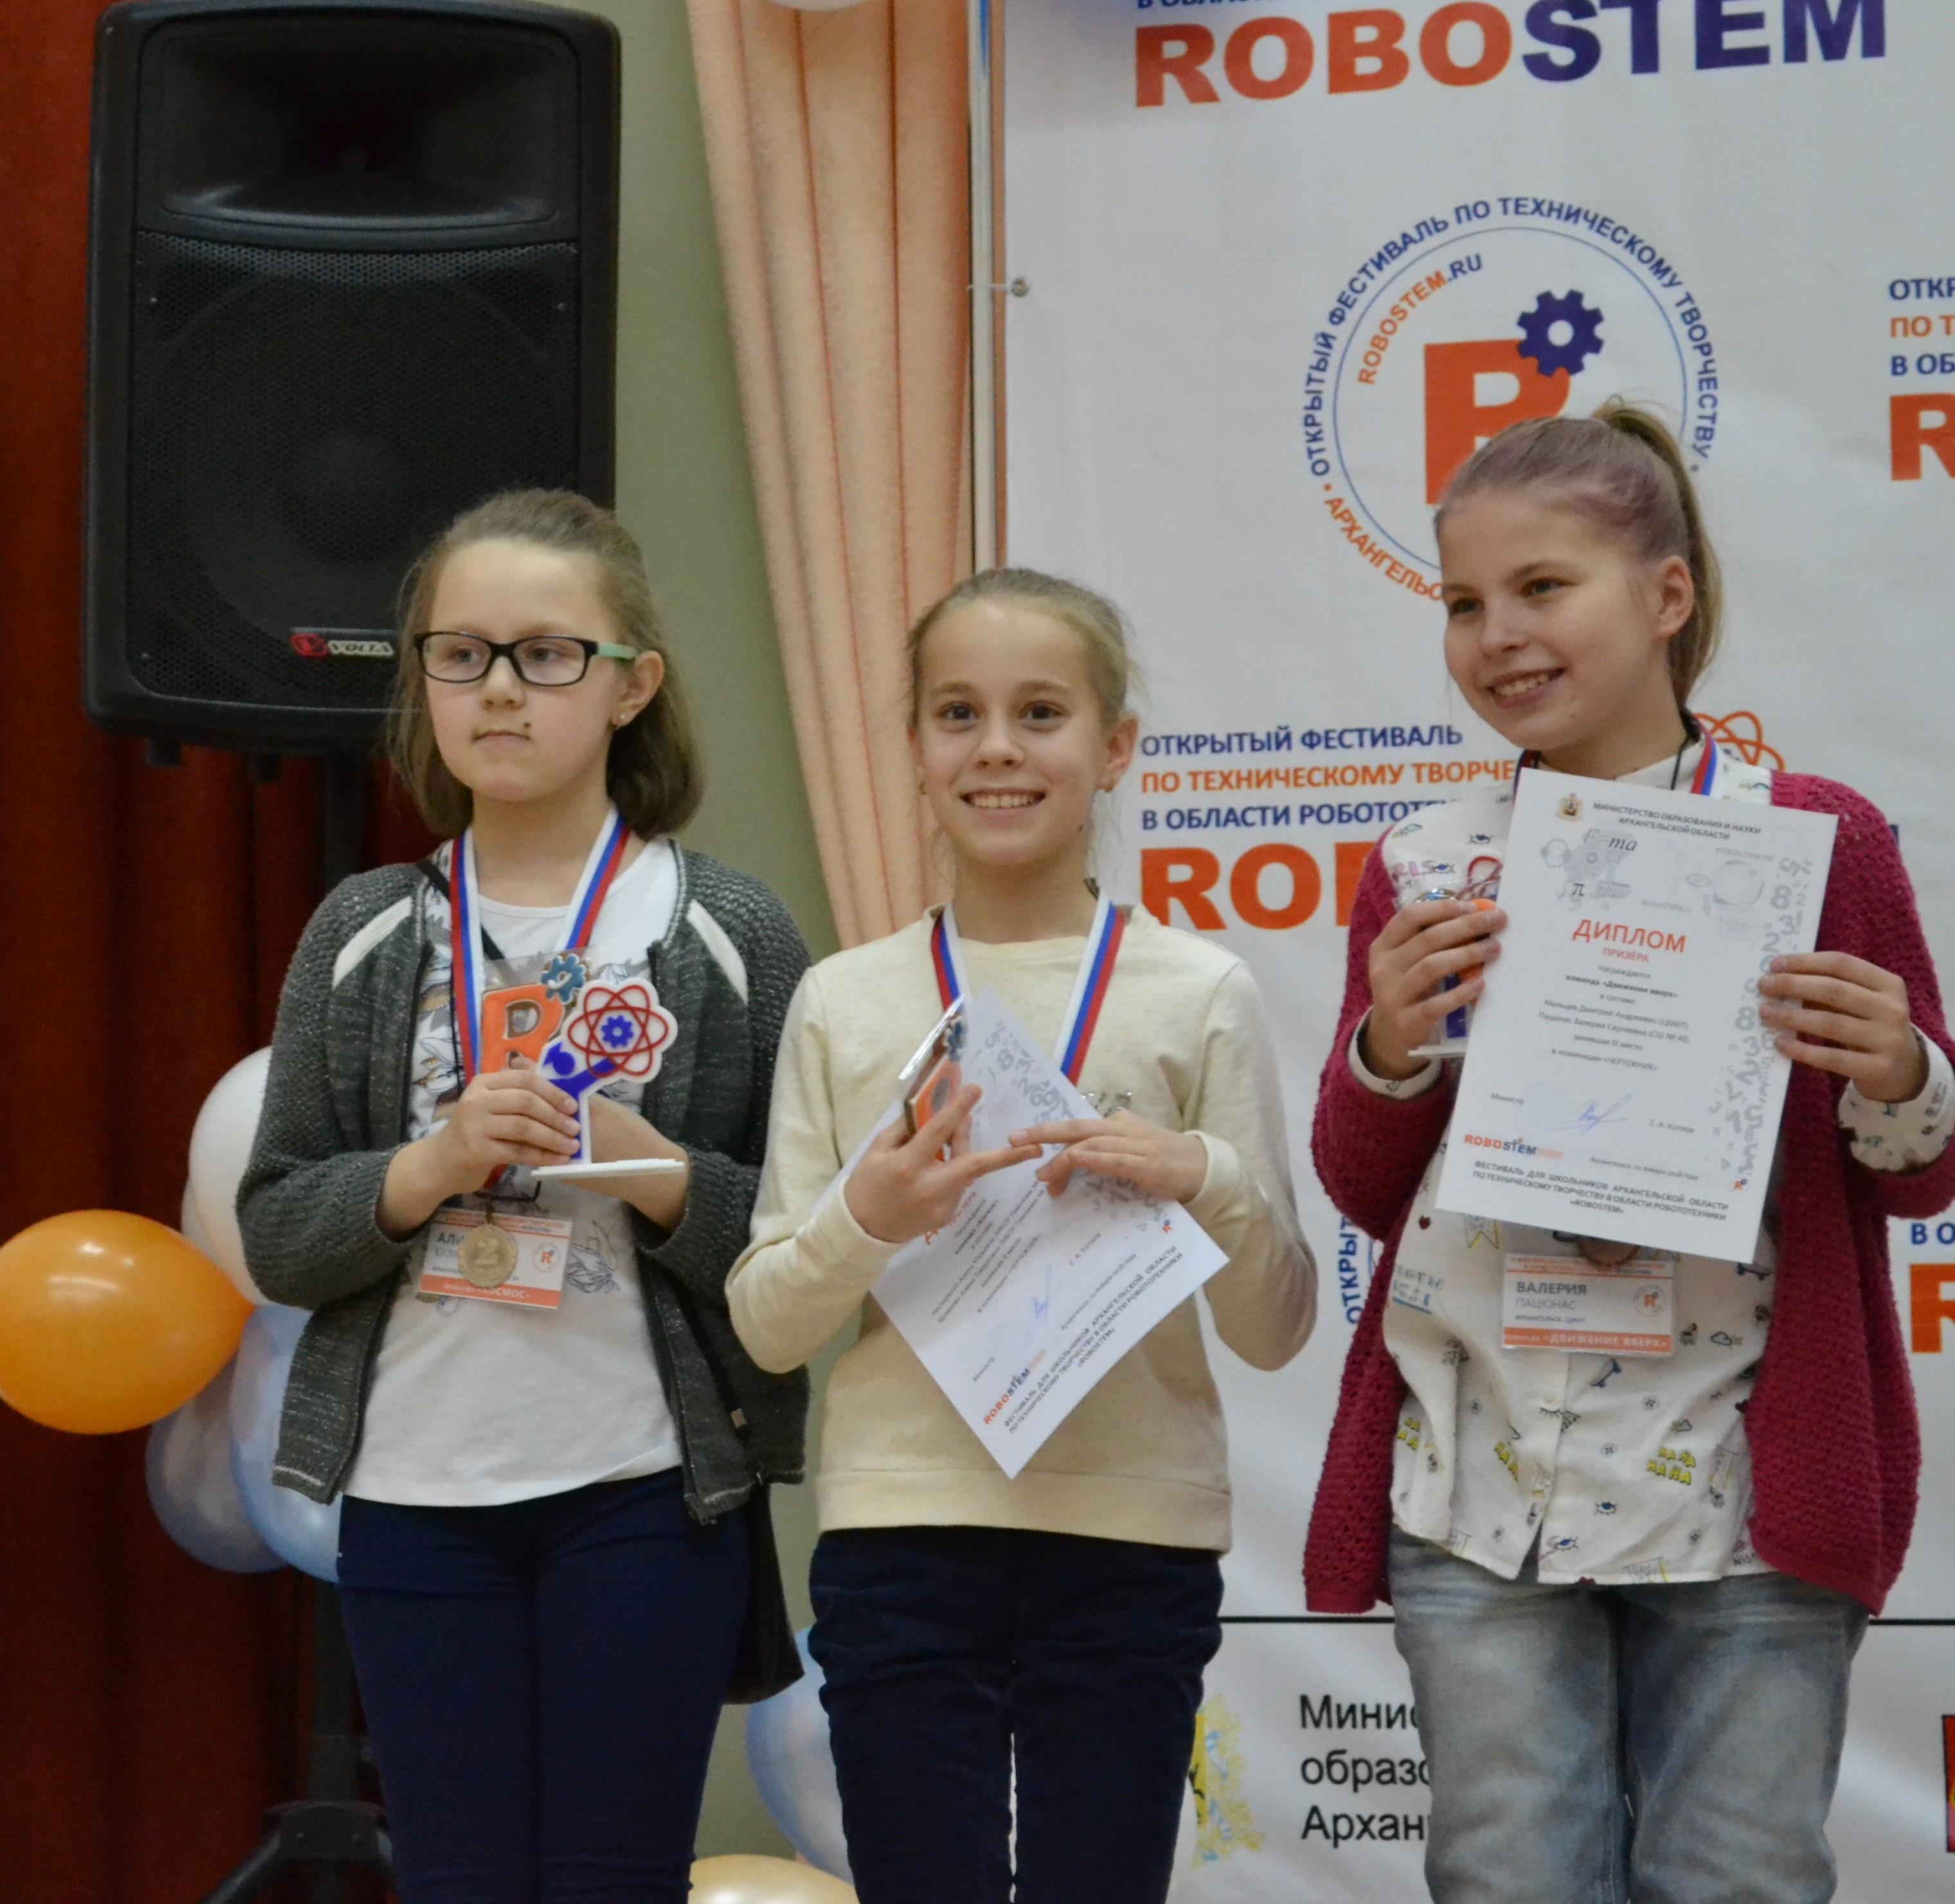 roboSTEM-2018-0132